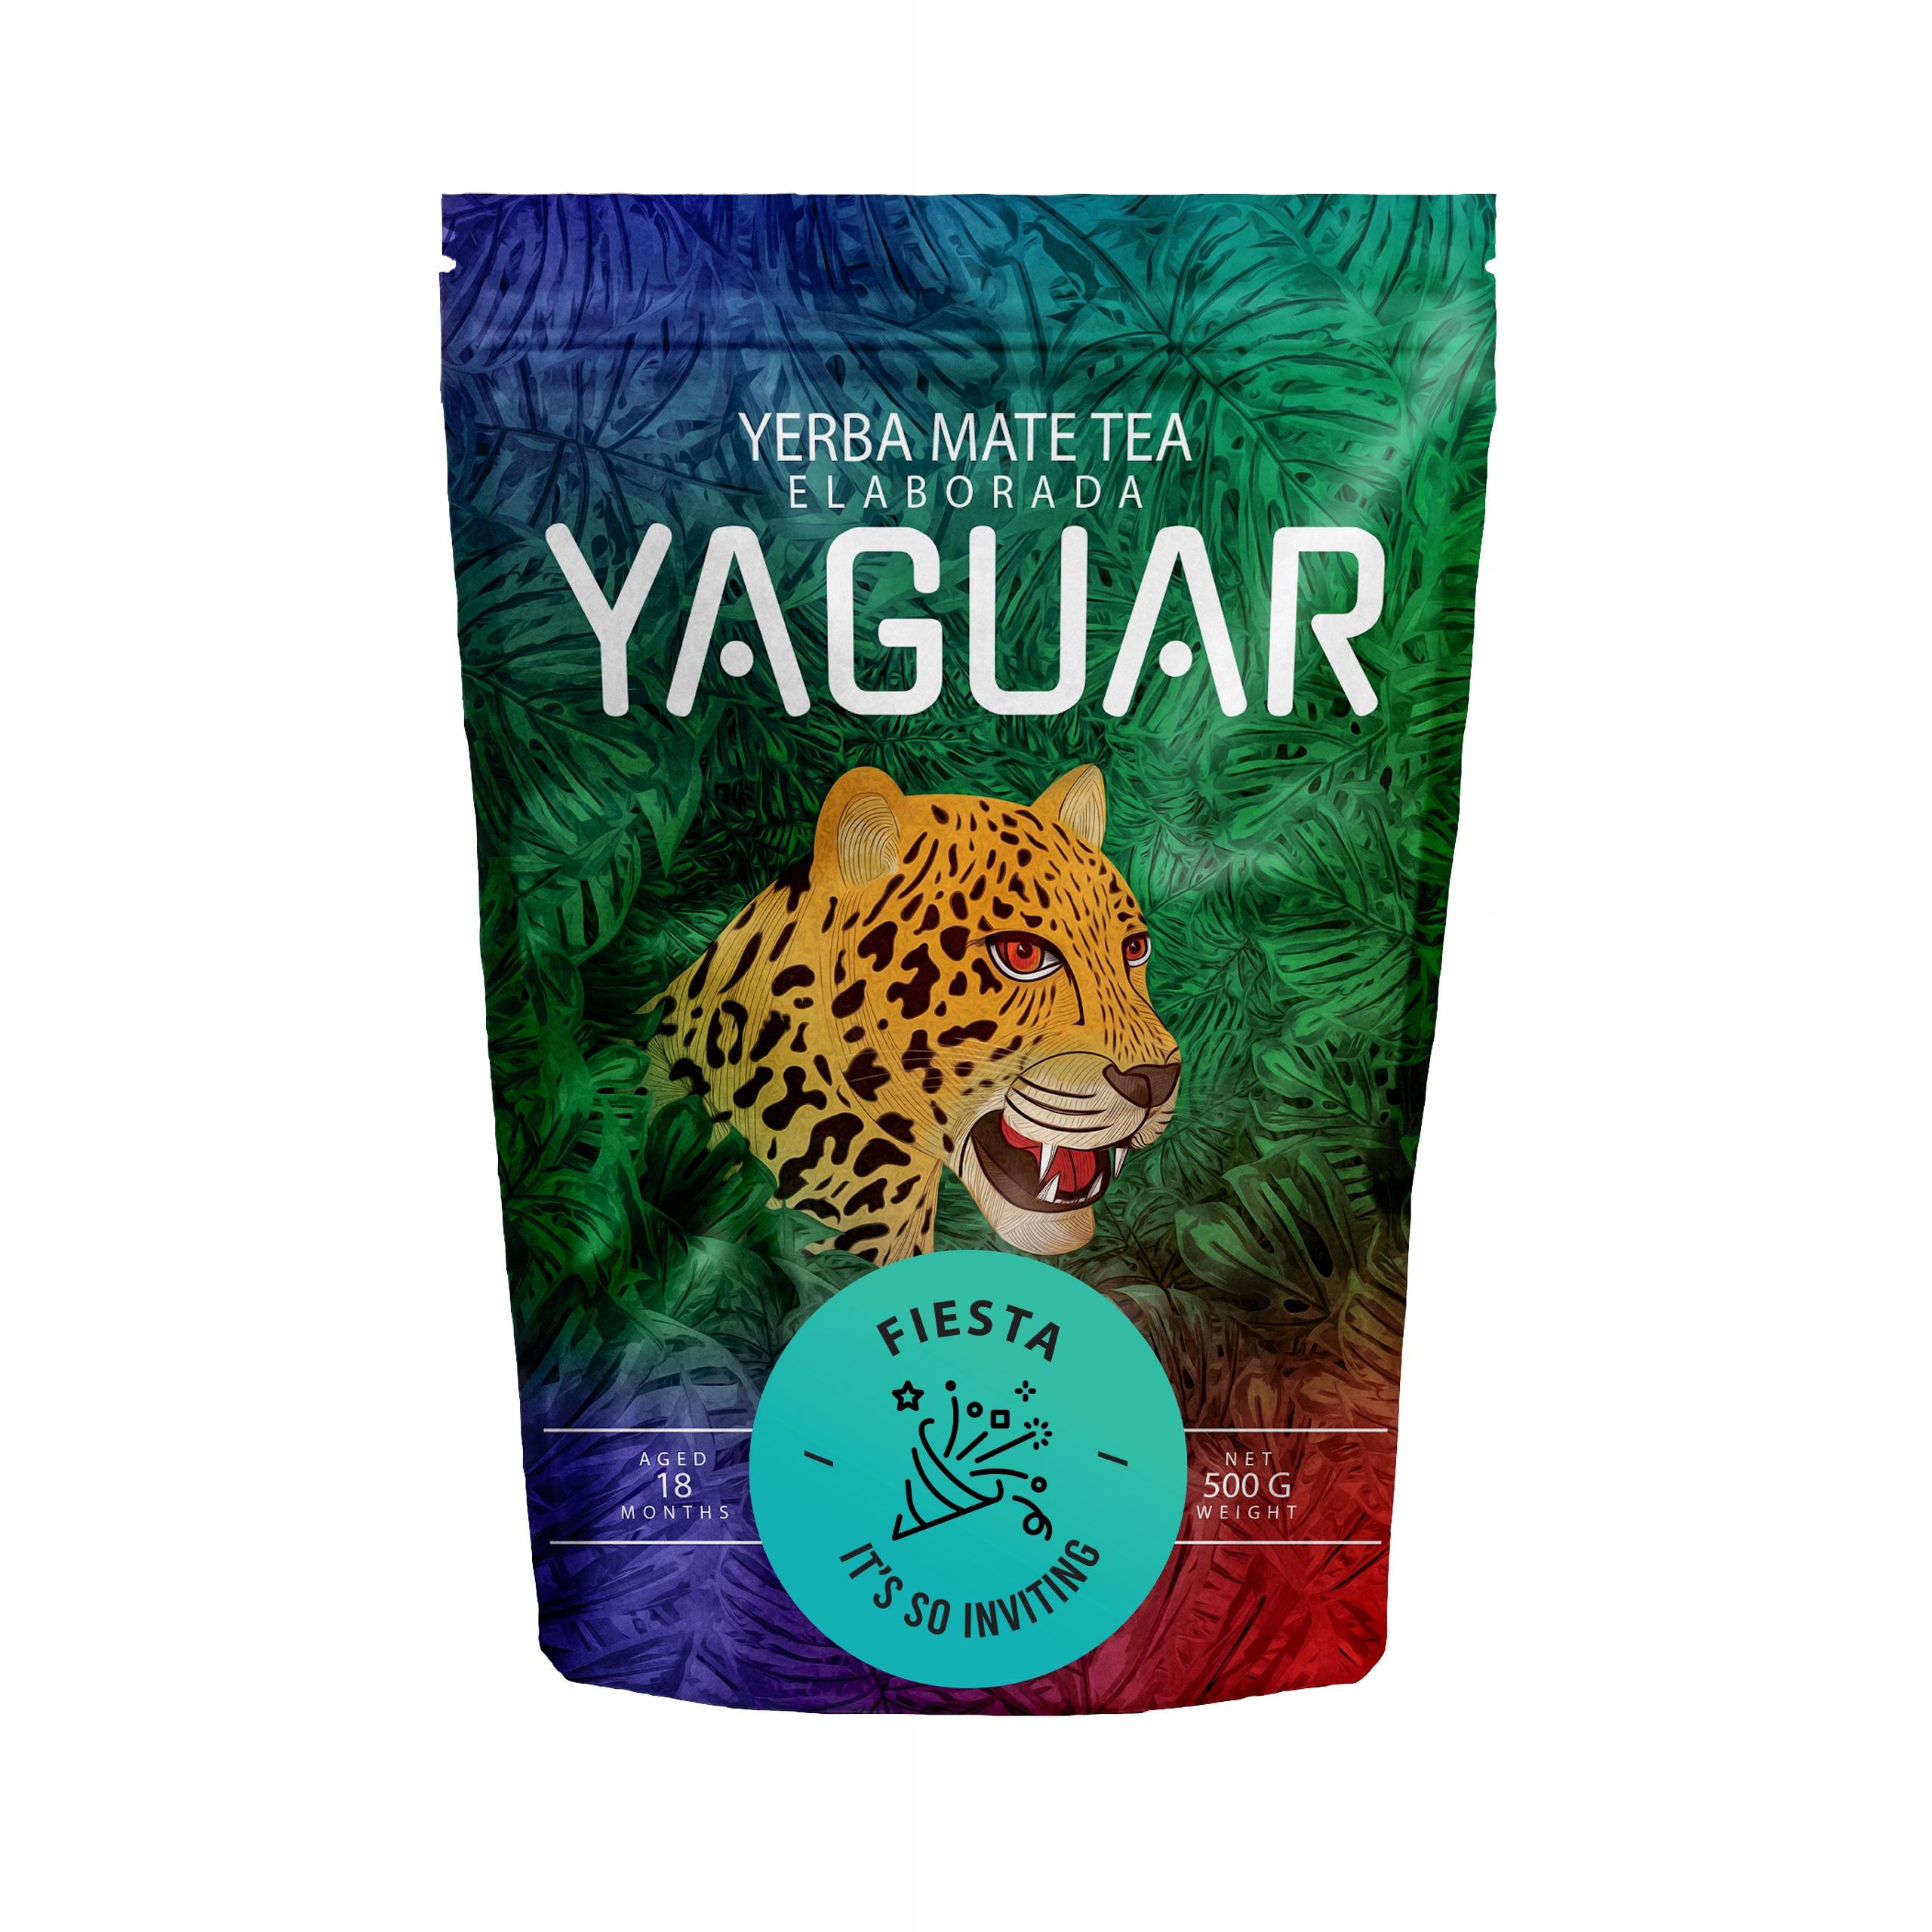 Yerba Mate Yaguar Fiesta energy 0.5кг 500г